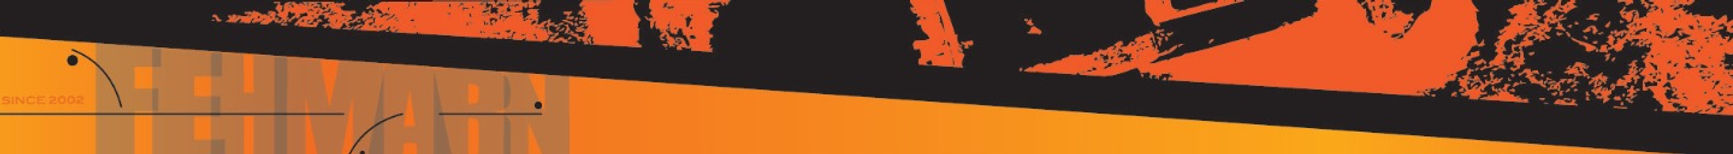 bandas naranjas _edited.jpg